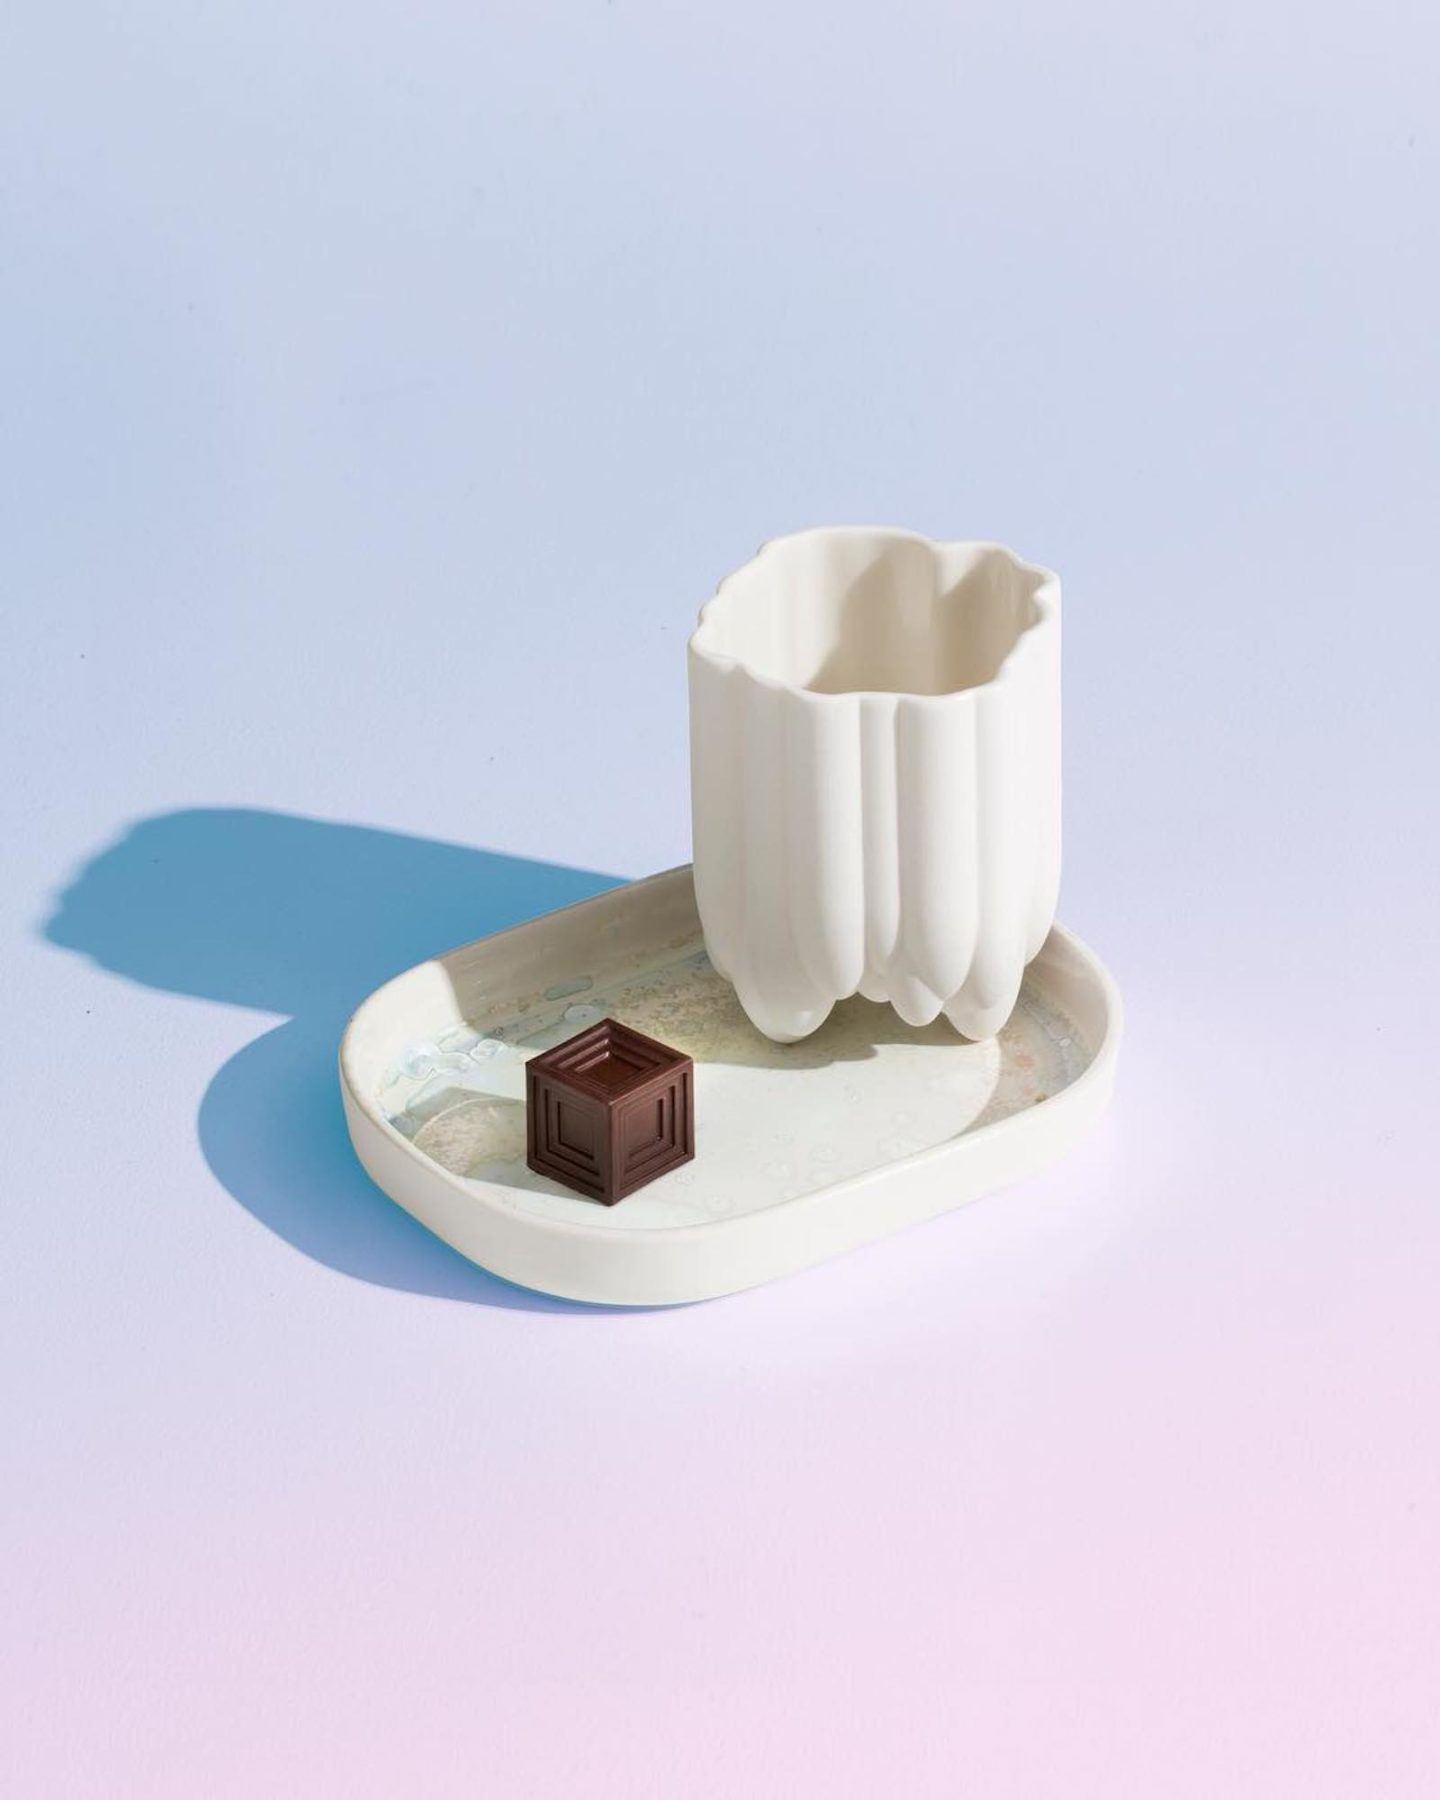 IGNANT-Design-Ryan-L-Foote-Chocolates-009